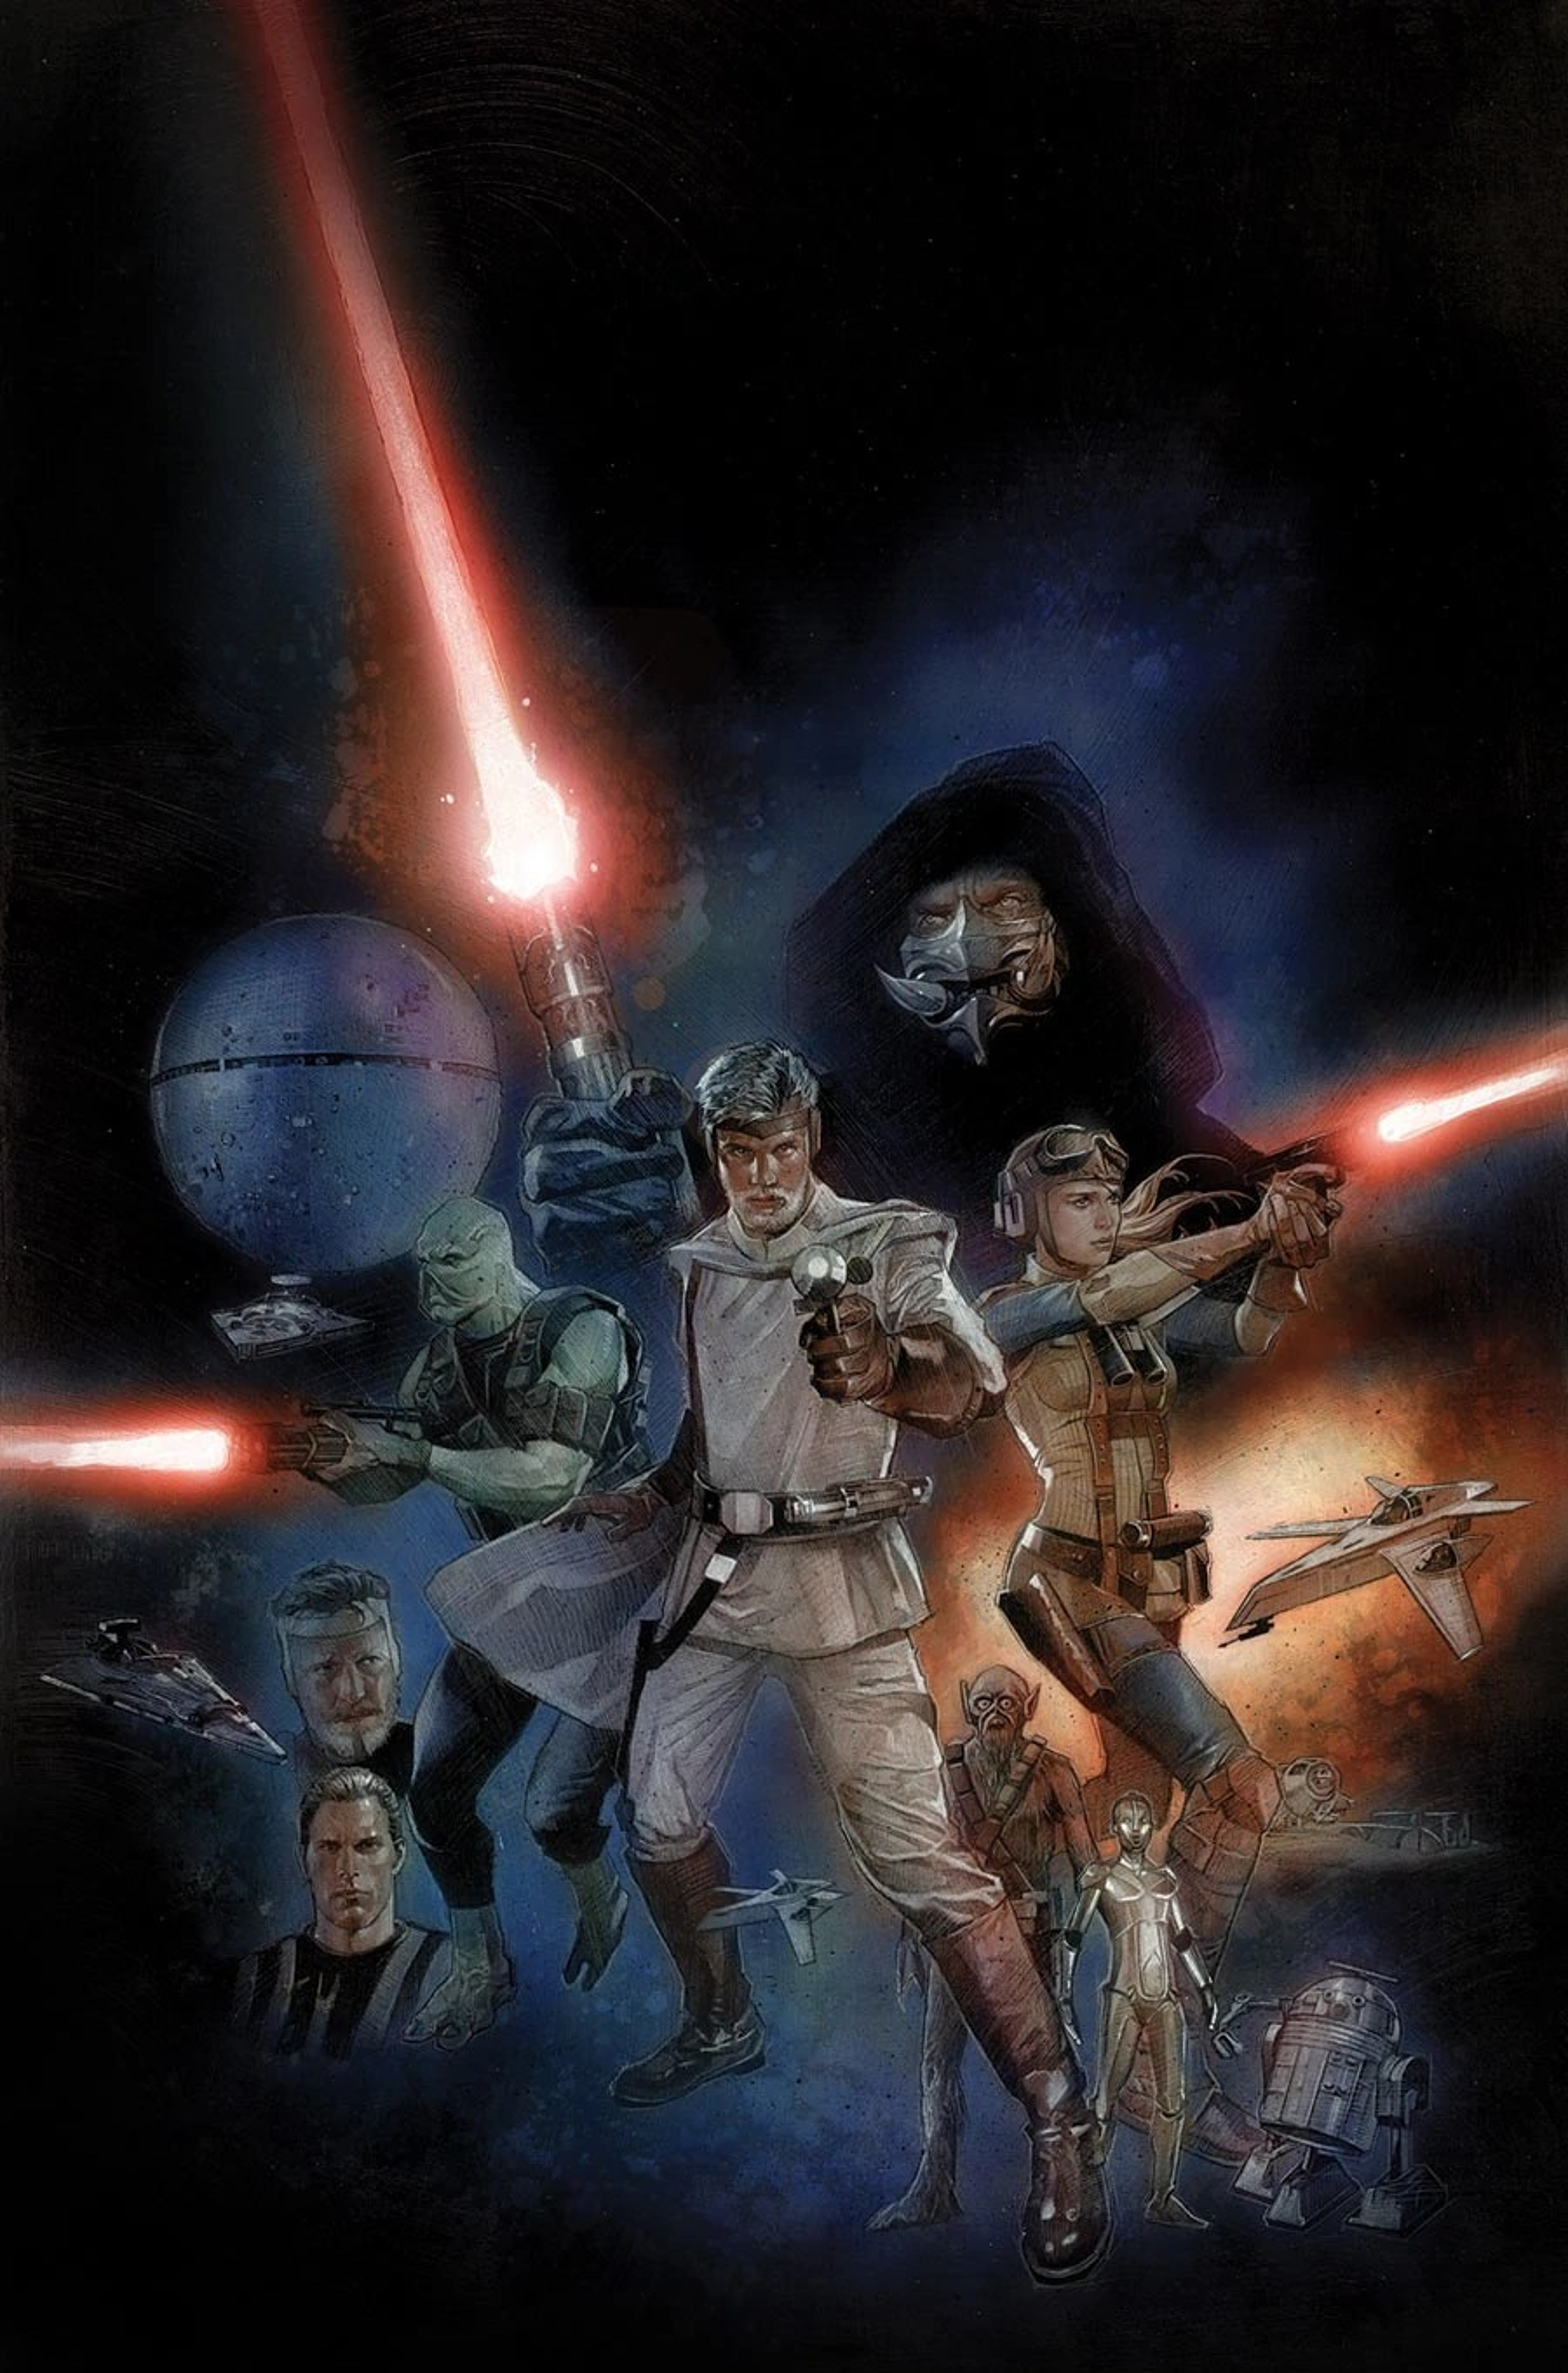 The Star Wars Original Comic